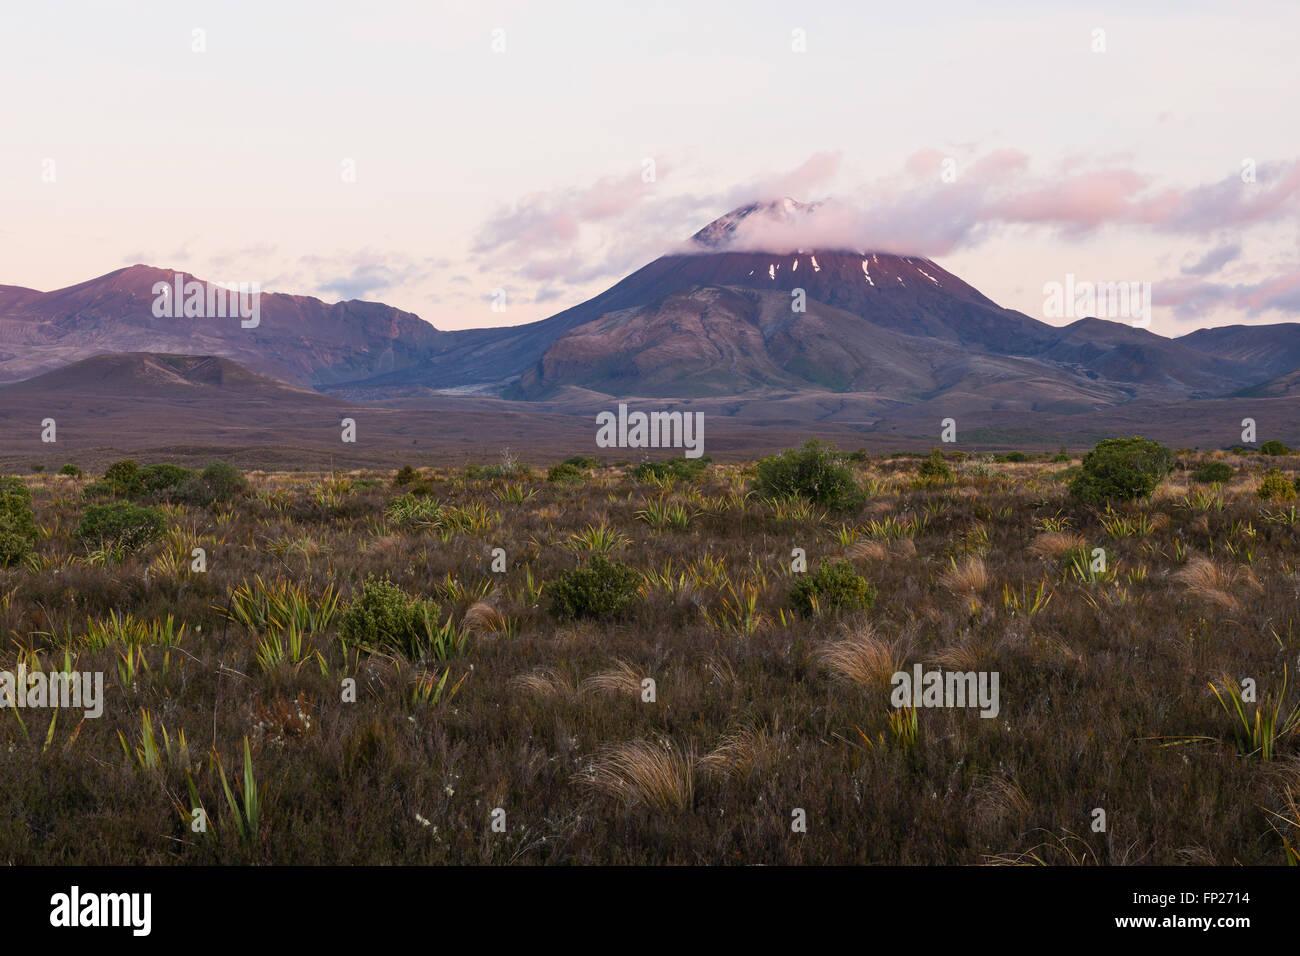 Mount Ngauruhoe volcano at sunset, Tongariro National Park, New Zealand - Stock Image